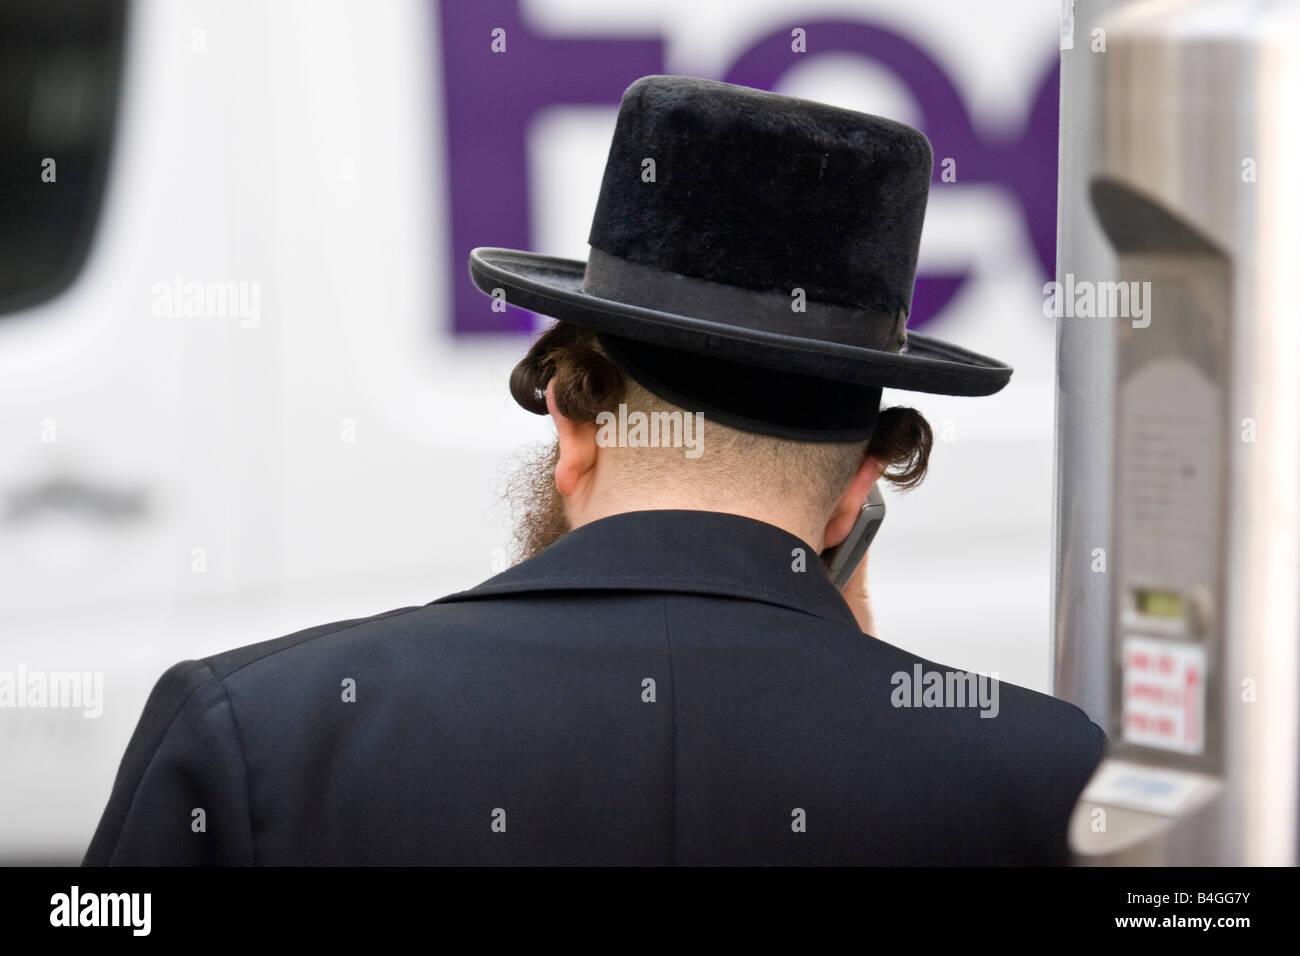 Orthodox Jew on Hoveniersstraat Diamond district in Antwerp, Belgium. - Stock Image